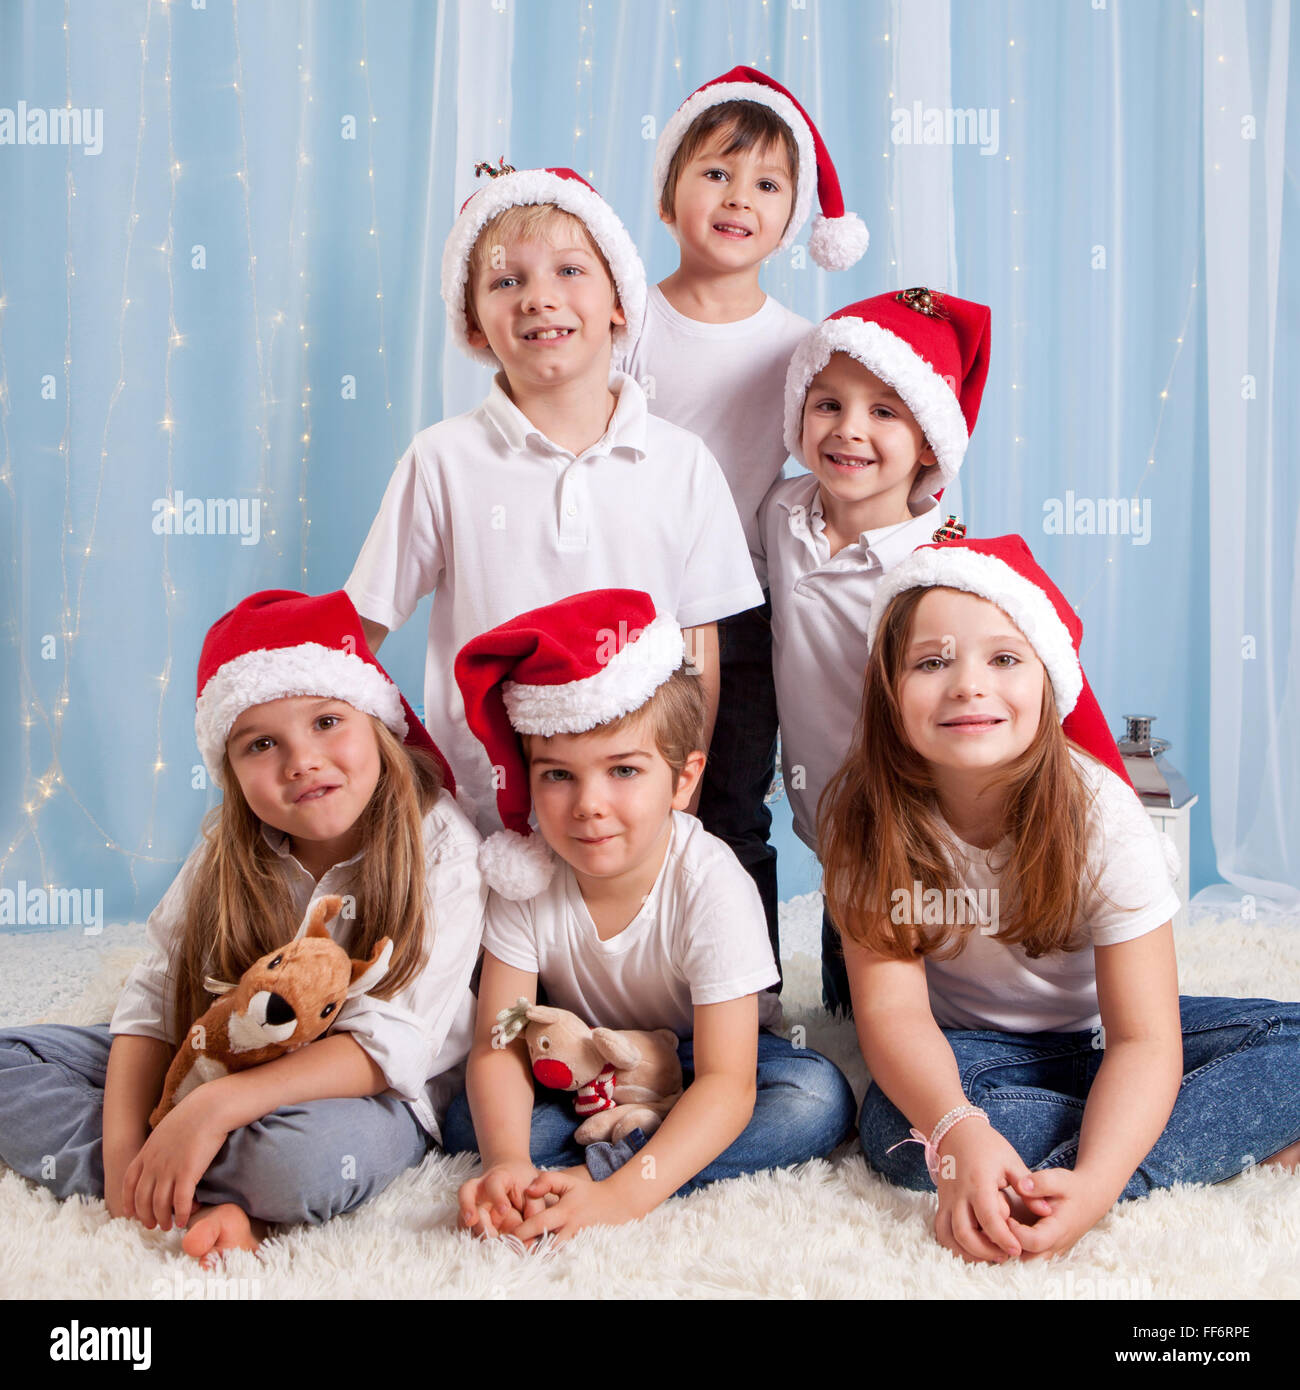 Six sweet kids, preschool children, having fun for christmas, square format - Stock Image